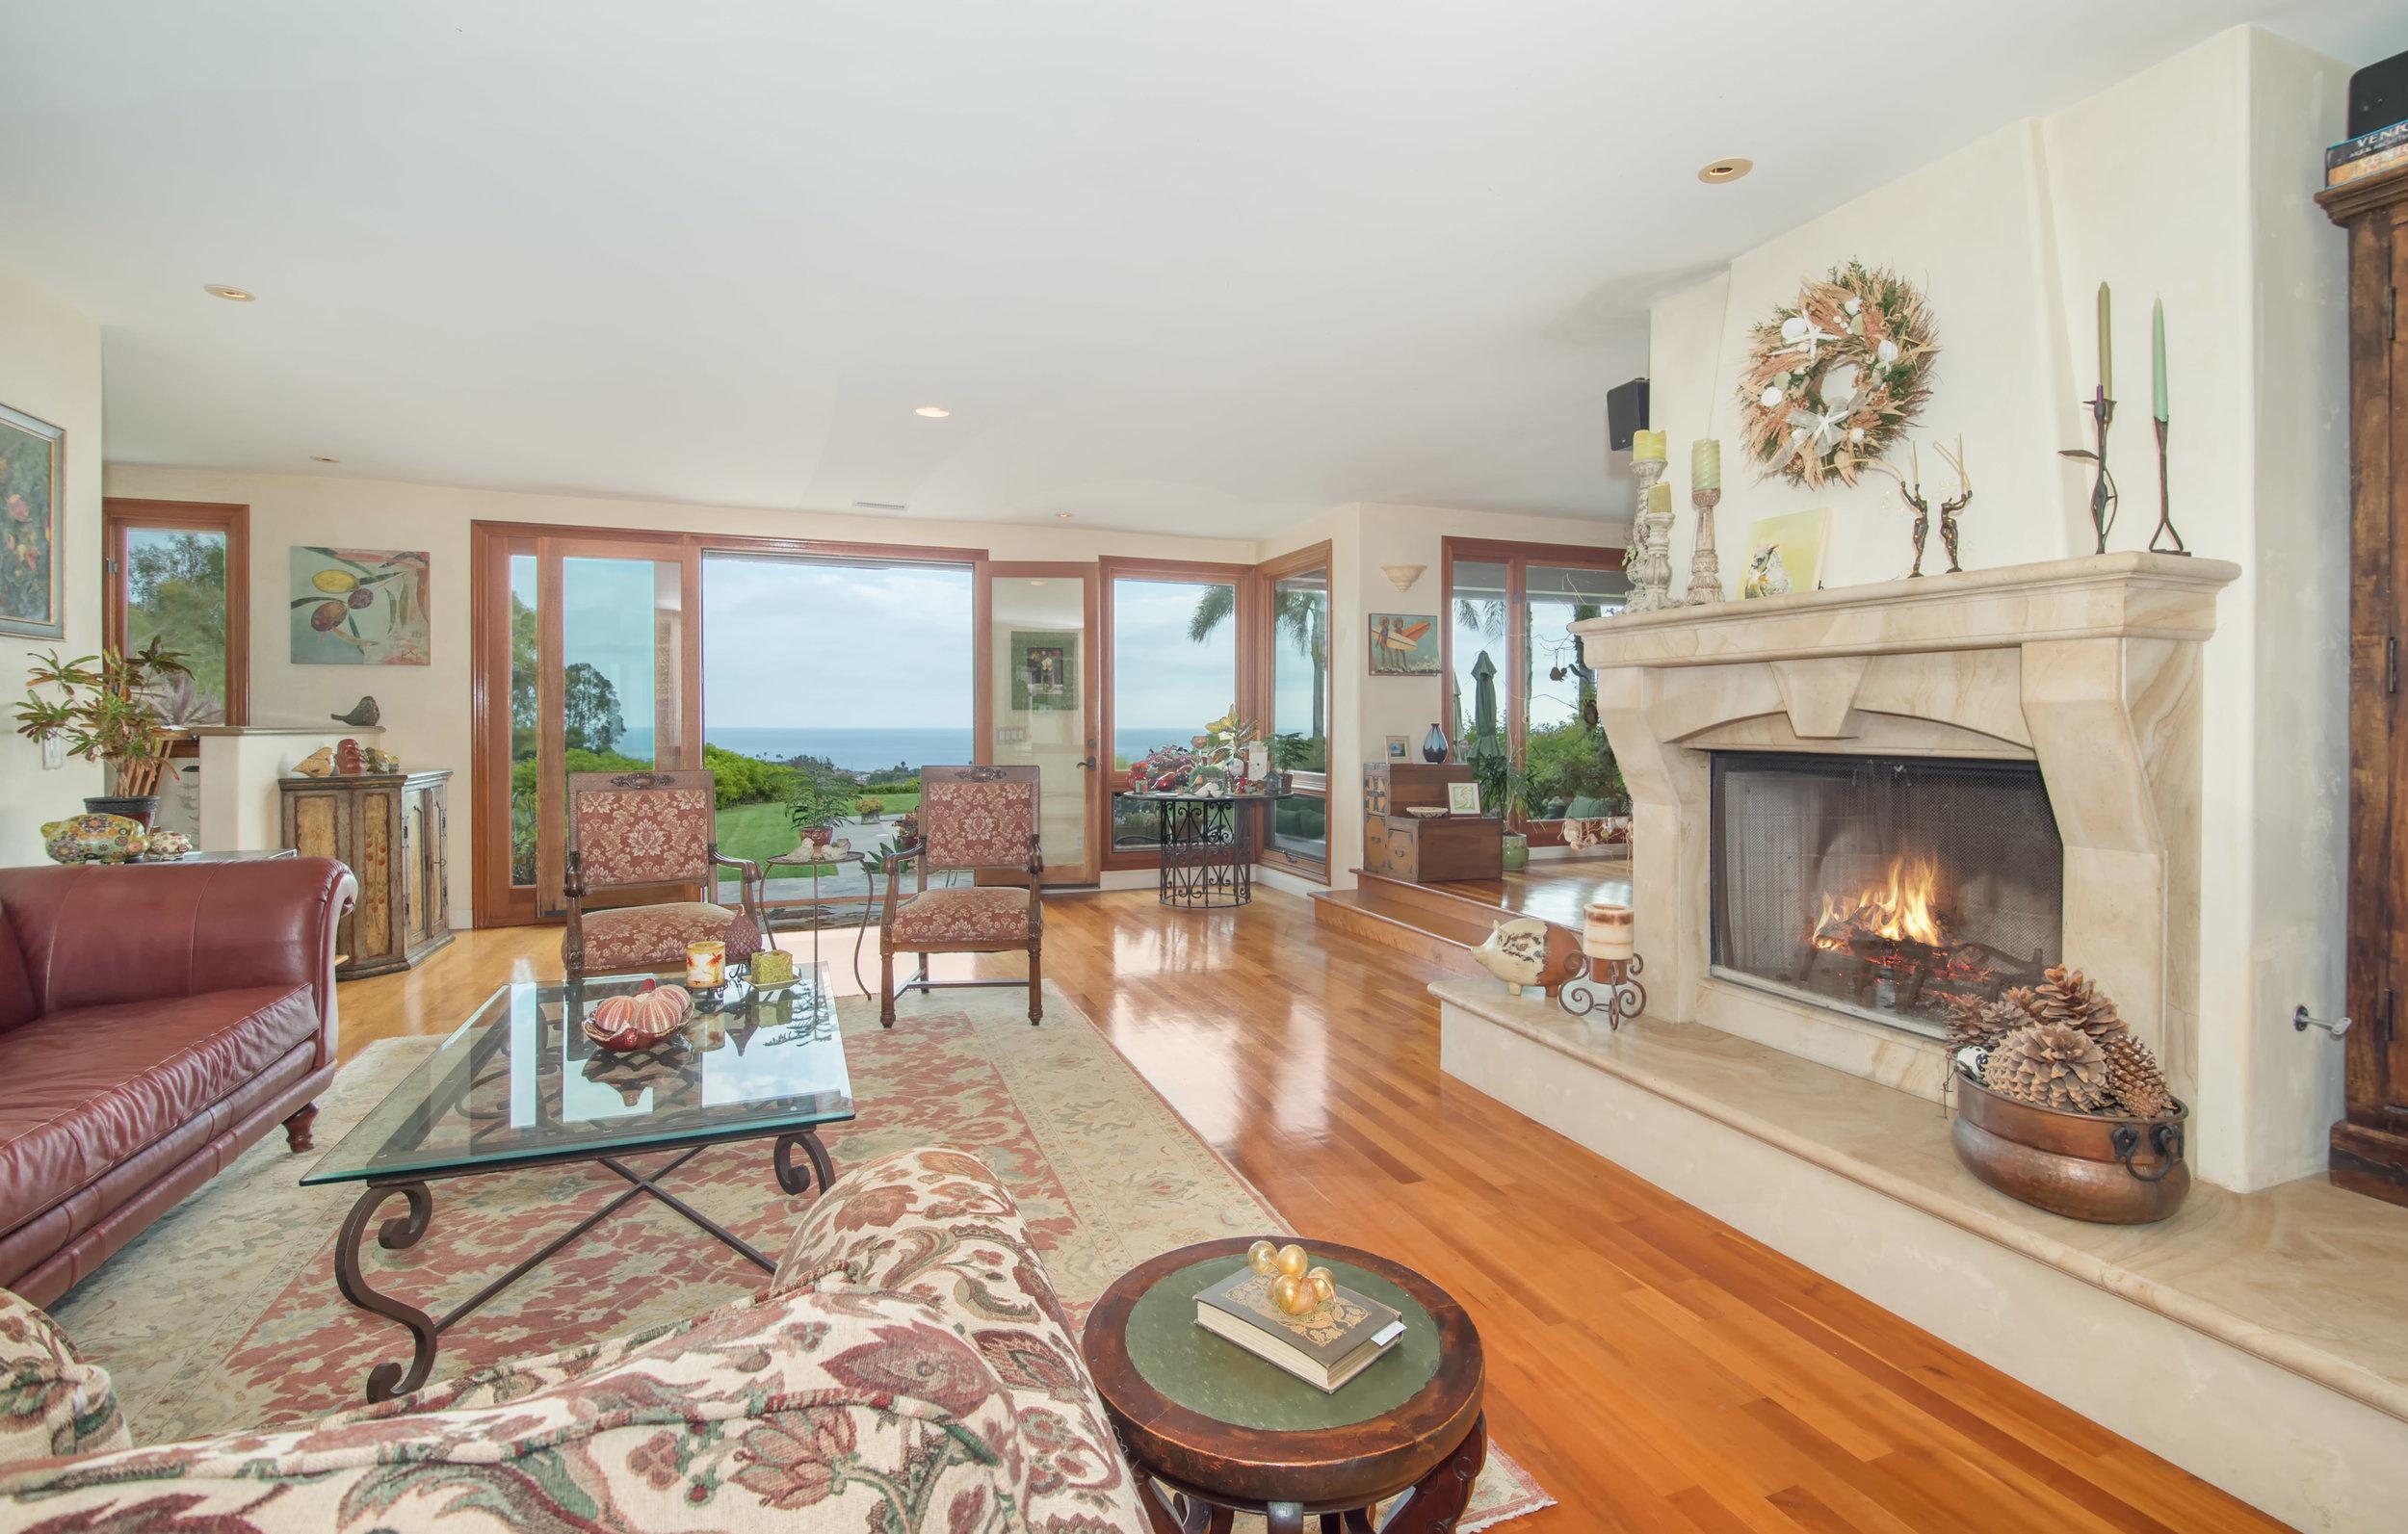 003 living room ocean view 29660 Harvester Road Malibu For Sale The Malibu Life Team Luxury Real Estate.jpg